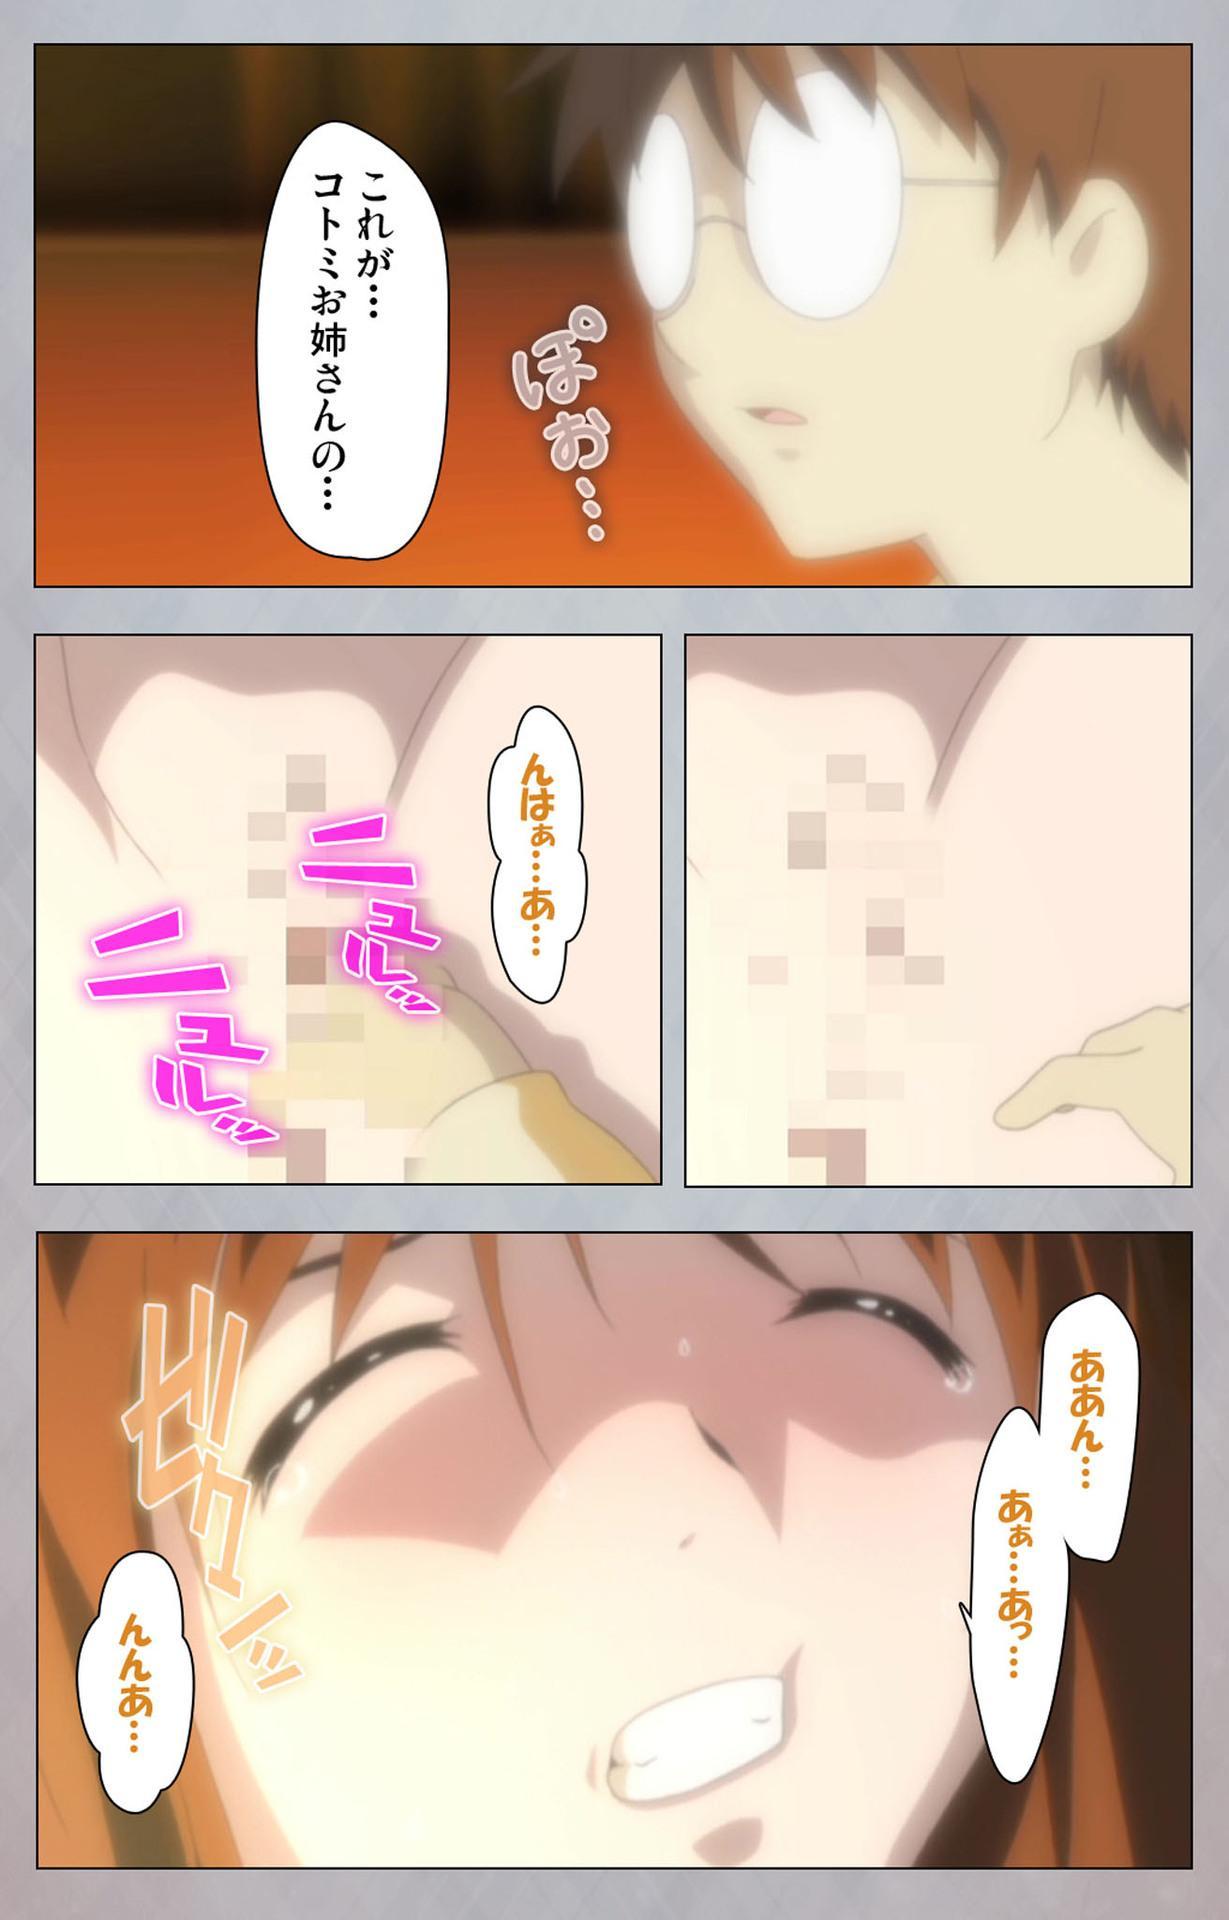 [Digital Works] [Full Color Seijin Ban] Sex Android ~Risou no Onna de Nuite yaru~ Kanzenban 81